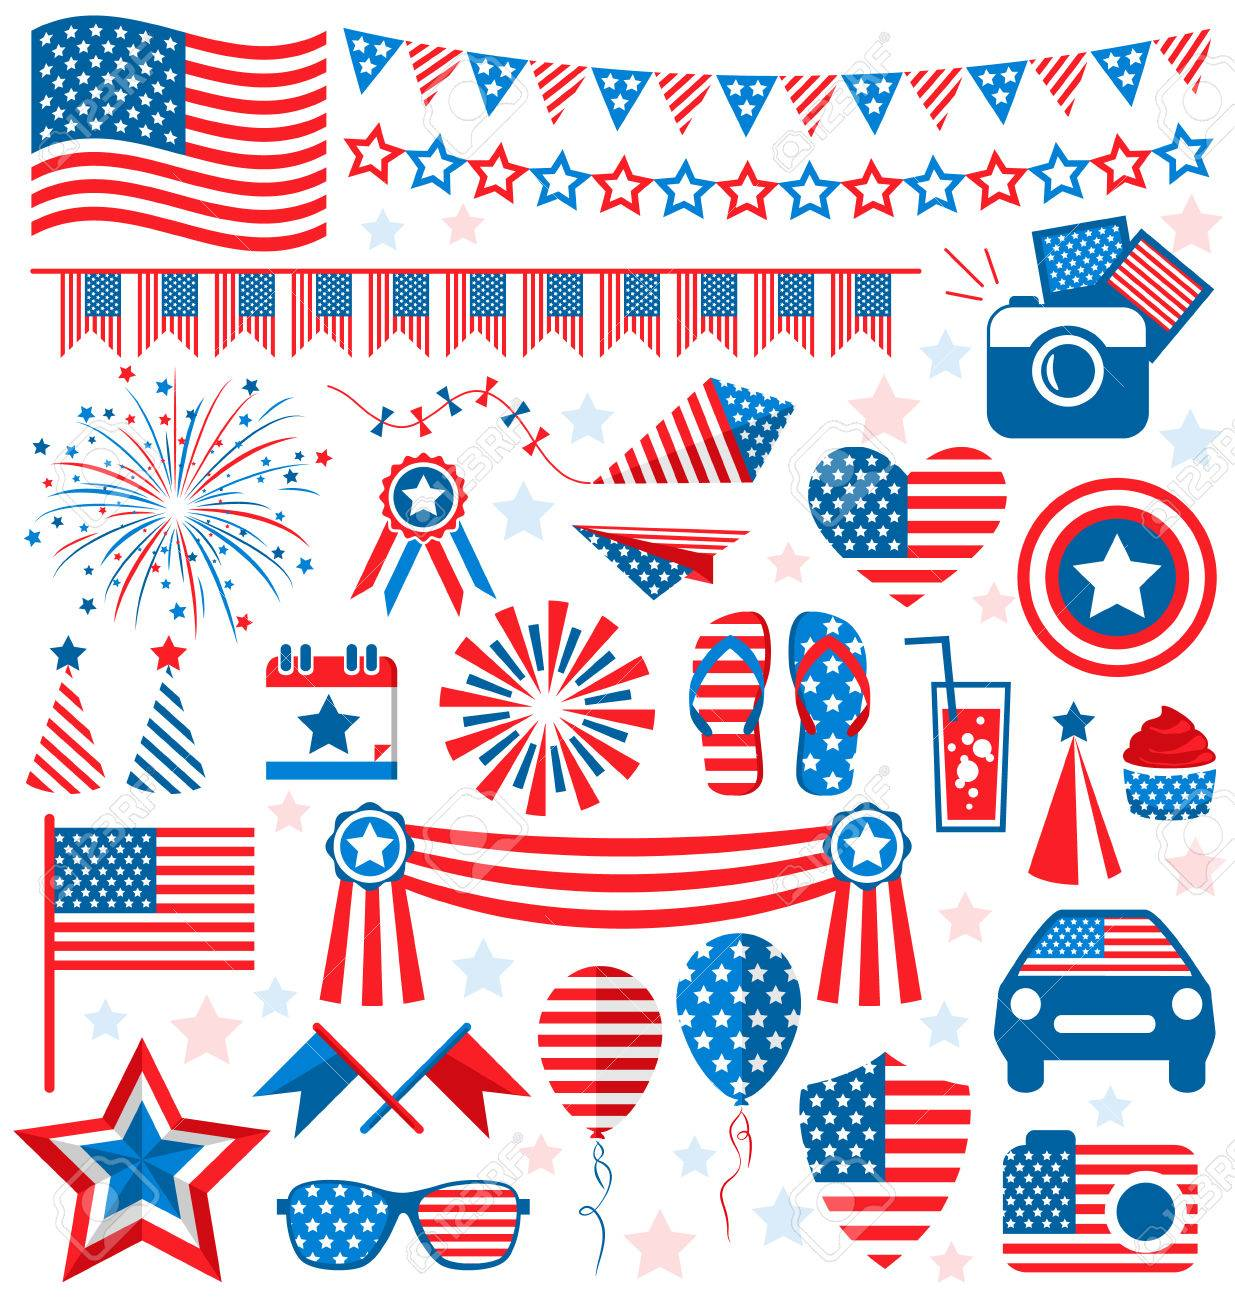 Usa Celebration Flat National Symbols Set For Independence Day